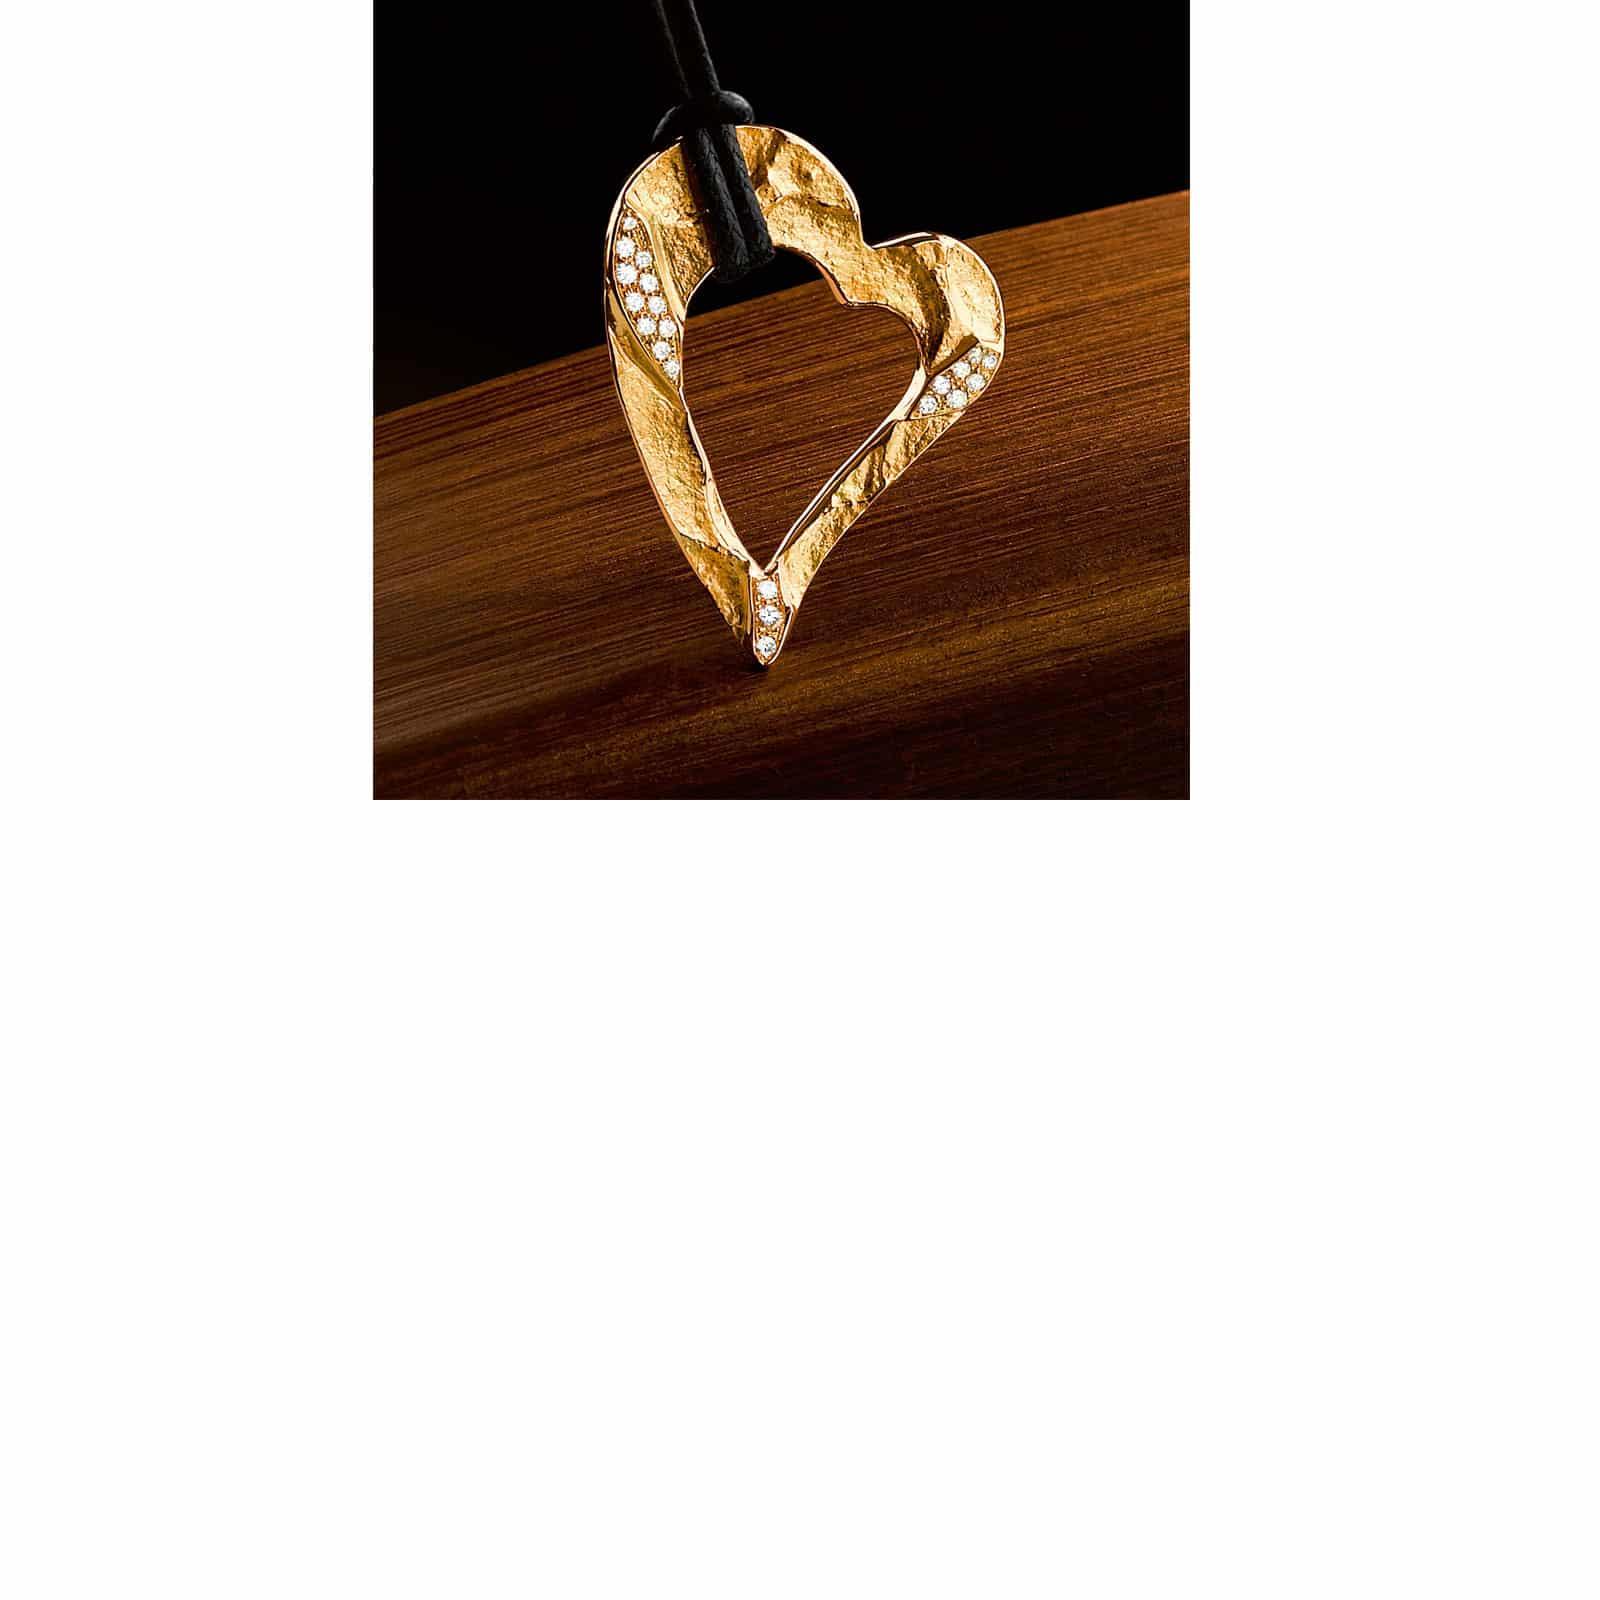 Michel-H-Lionel-Meylan-horlogerie-joaillerie-vevey.jpg  Modifier | Supprimer définitivement | Afficher | Miniatures Margaux